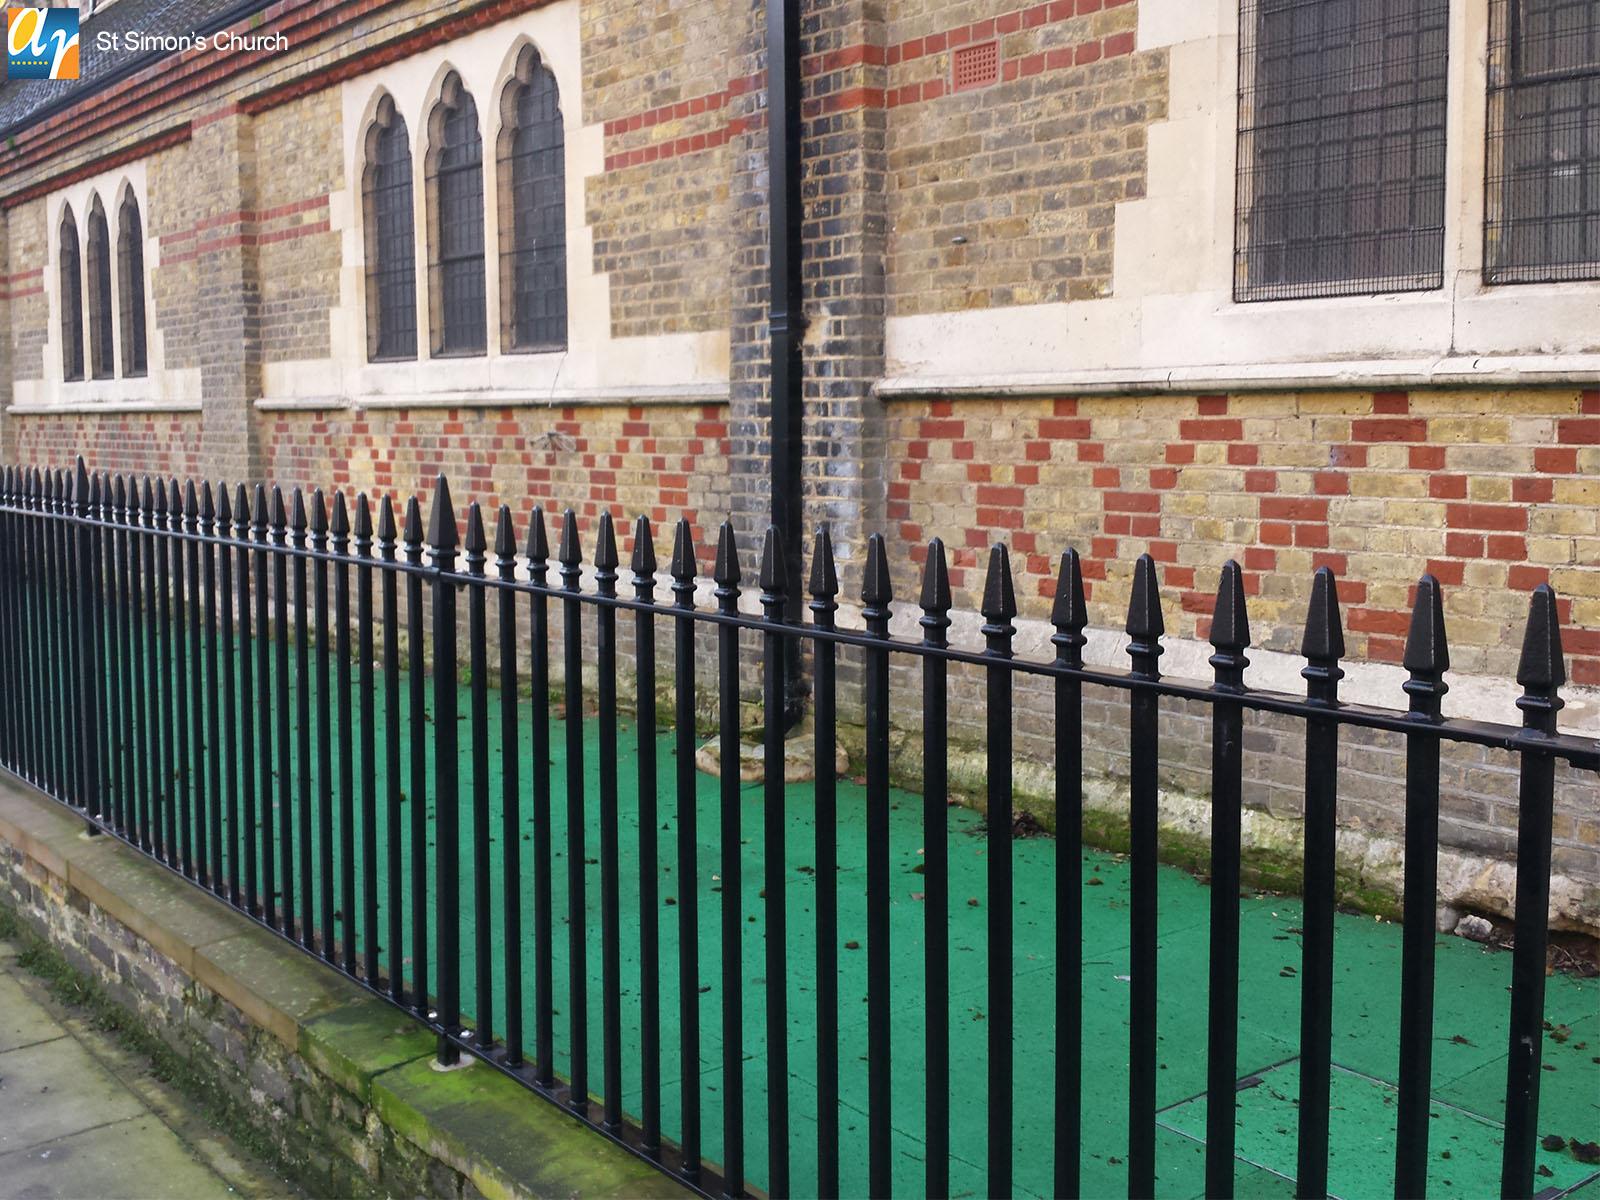 St. Simon's Church Kennington metal railings